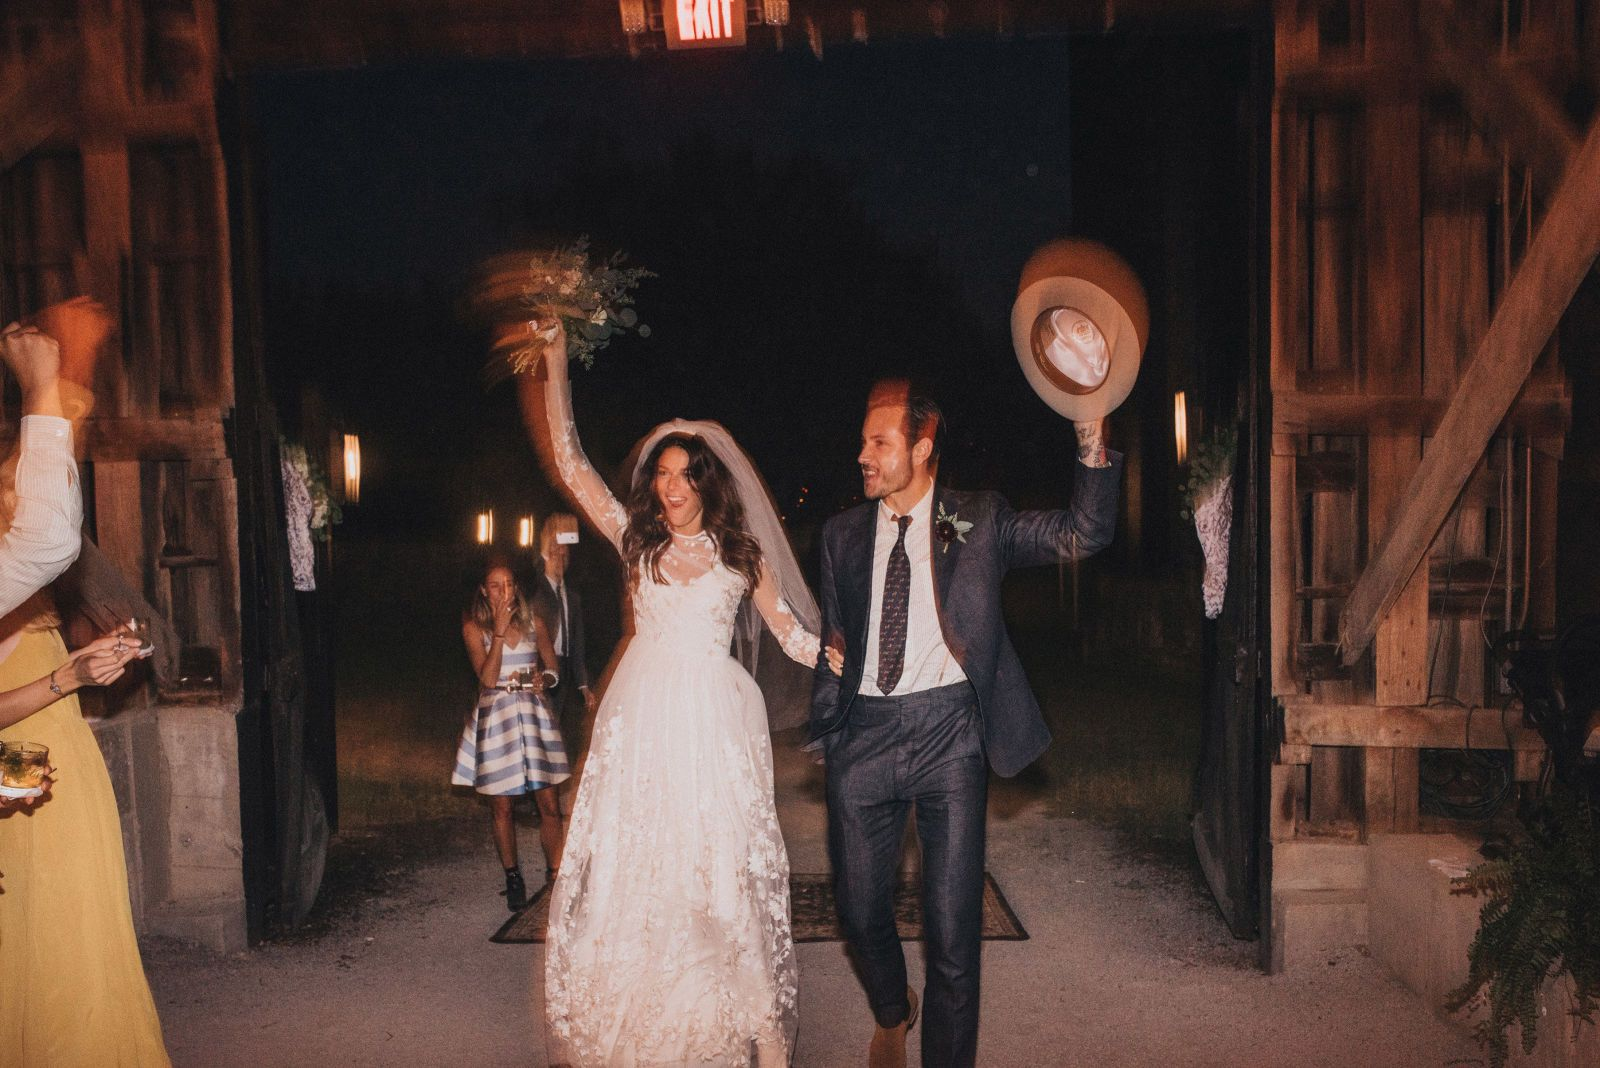 The Ultimate Barn Wedding: Whitney Brown Carlos Naudes Wedding in Kentucky